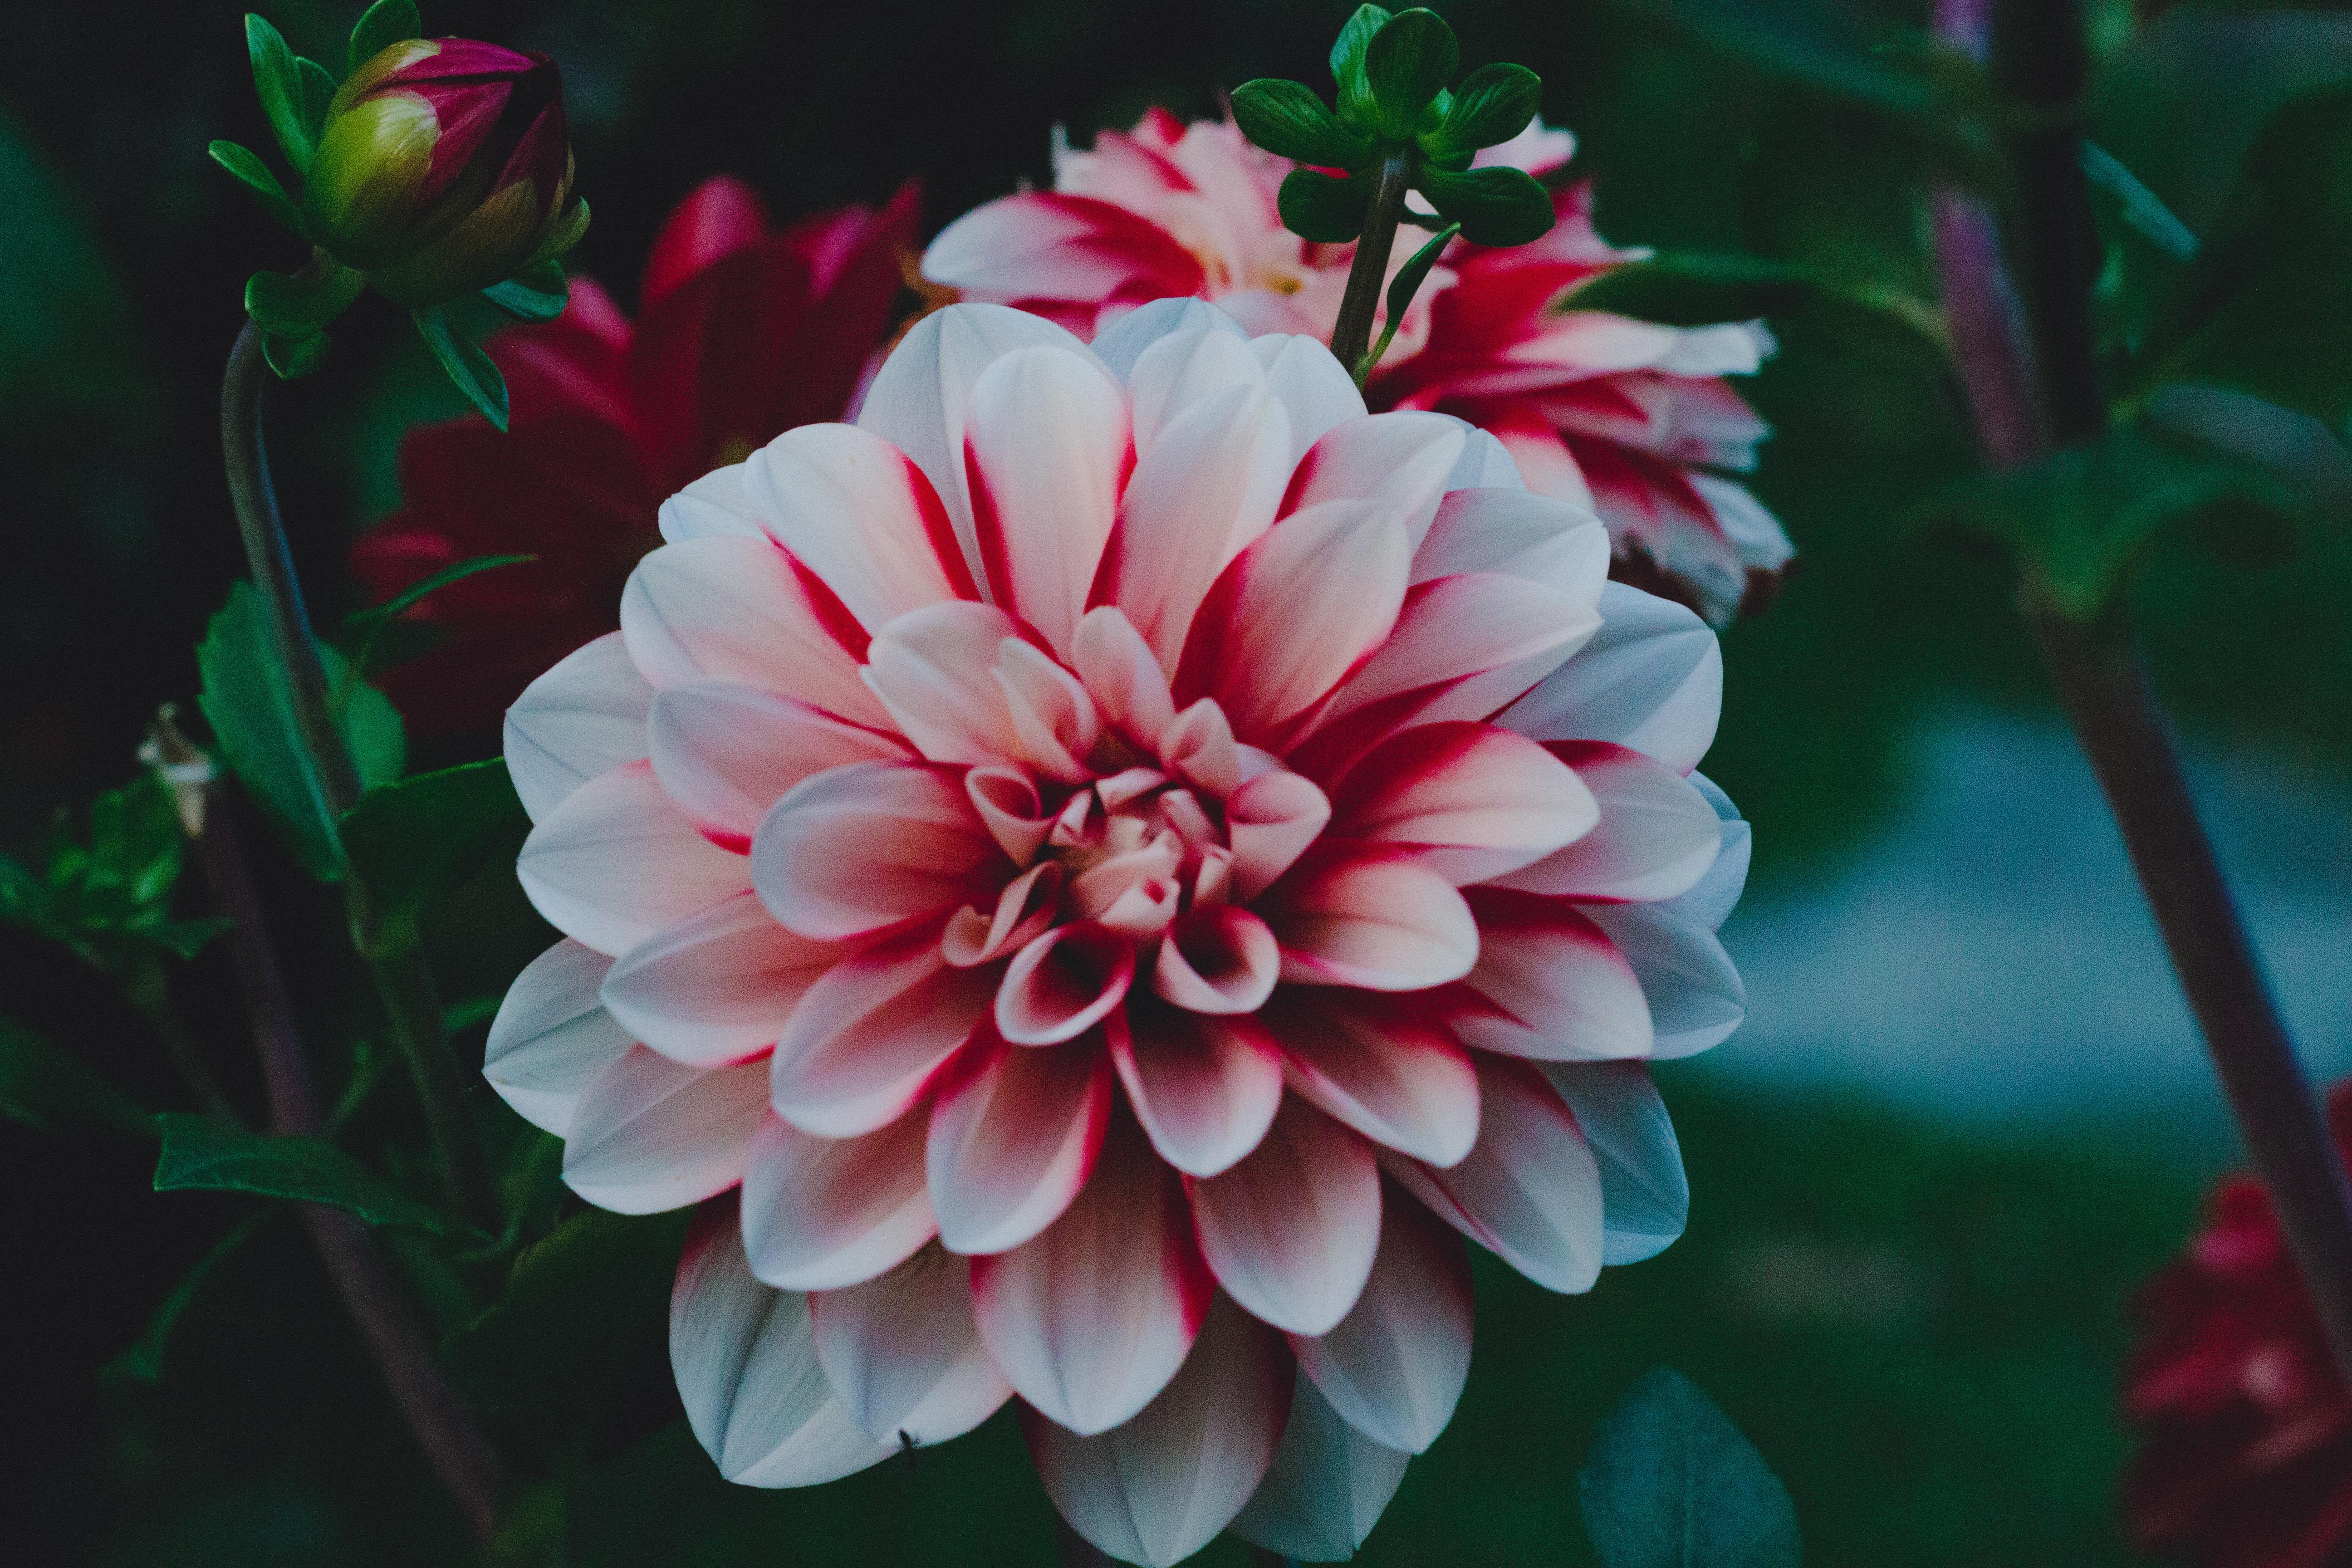 126284 Screensavers and Wallpapers Petals for phone. Download Flowers, Petals, Bud, Dahlia, Dahlia Rebekas World, Georgina Rebekah World pictures for free